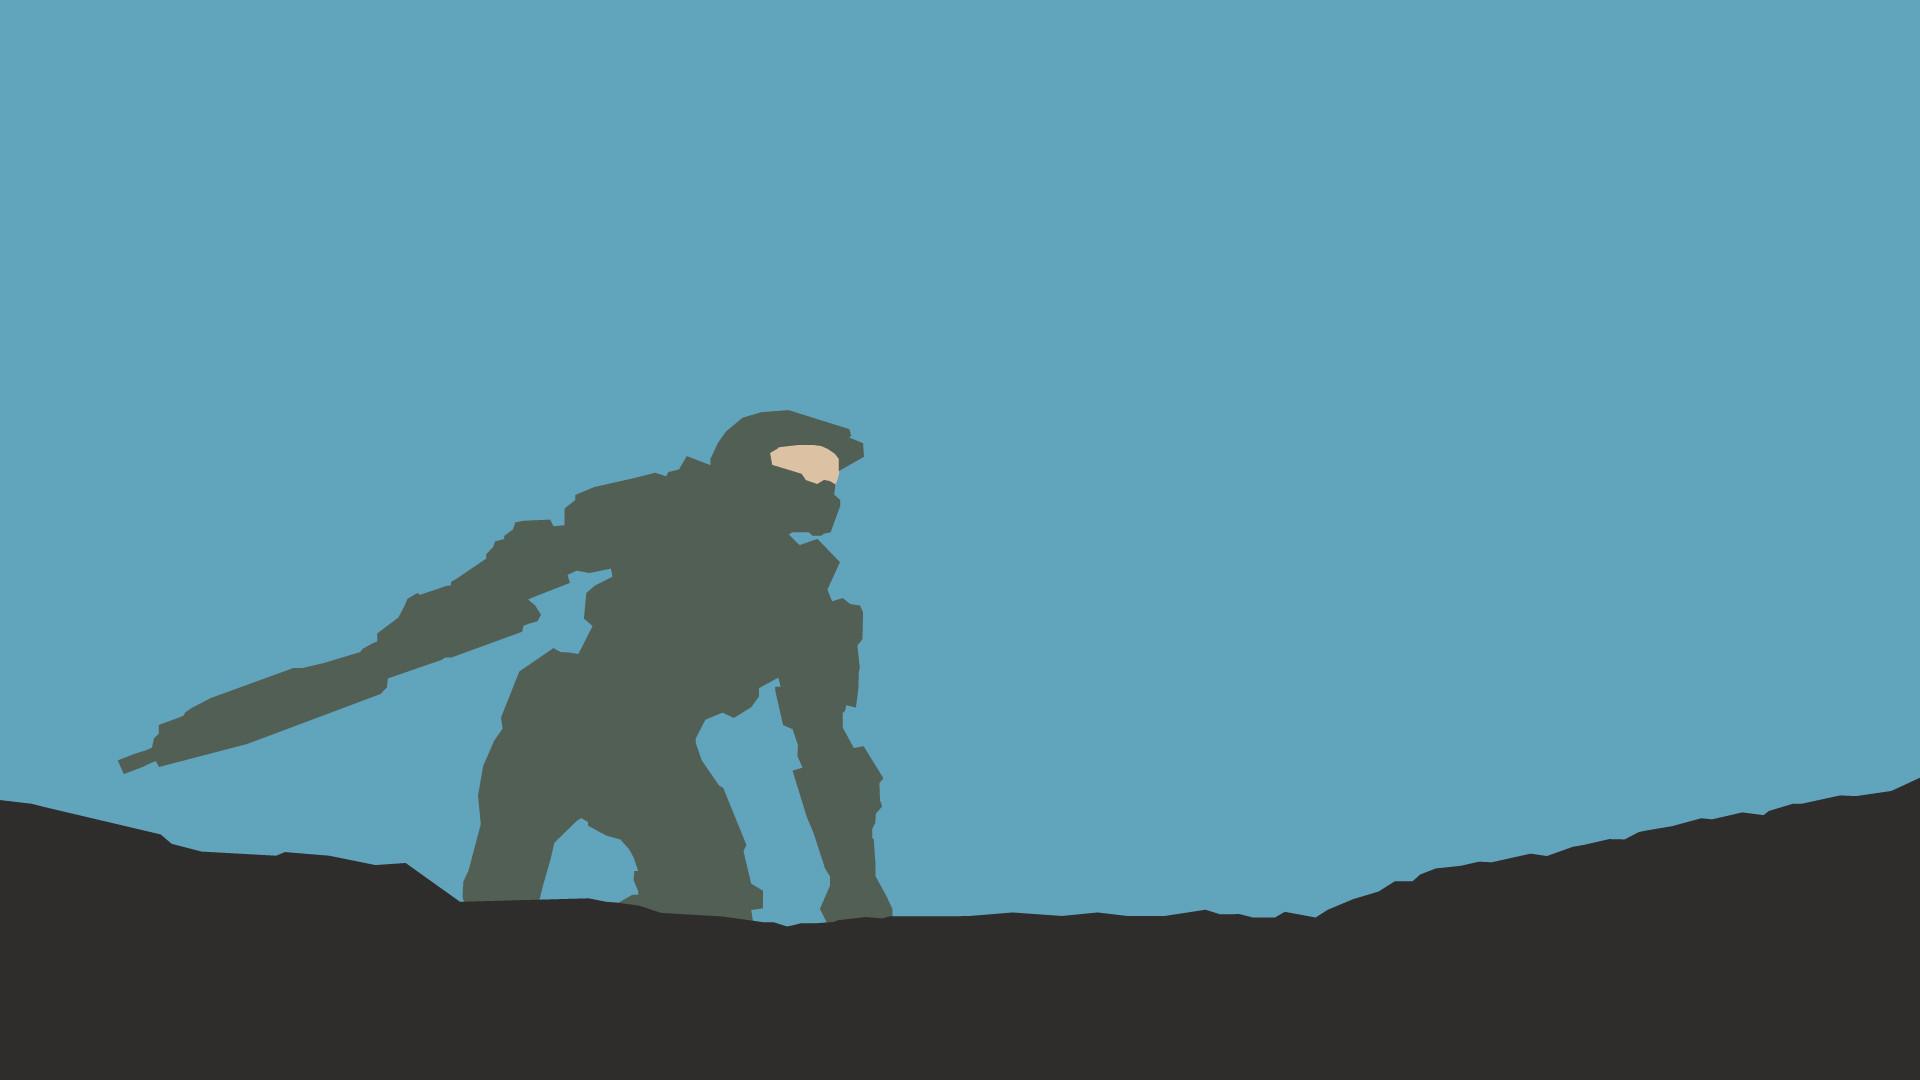 Minimalist Gaming Wallpaper (83+ Images